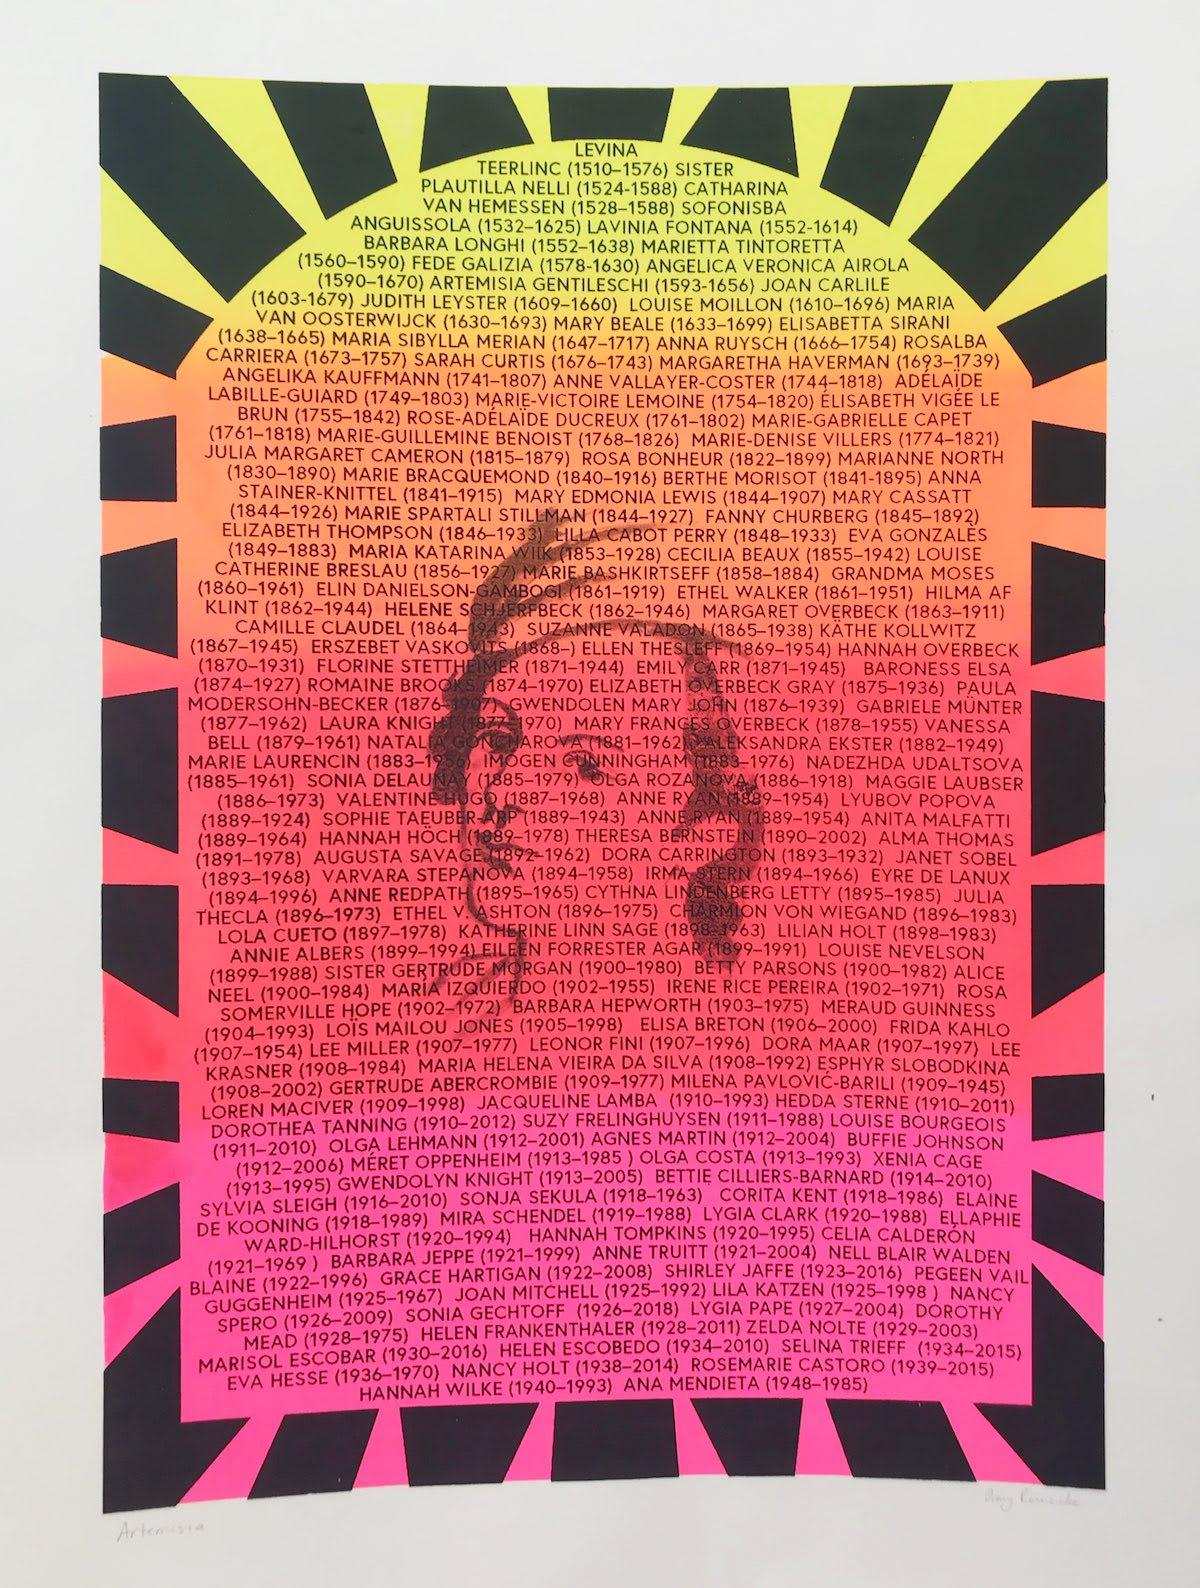 Putney School of Art and Design, Amy Reinecke, Artemesia